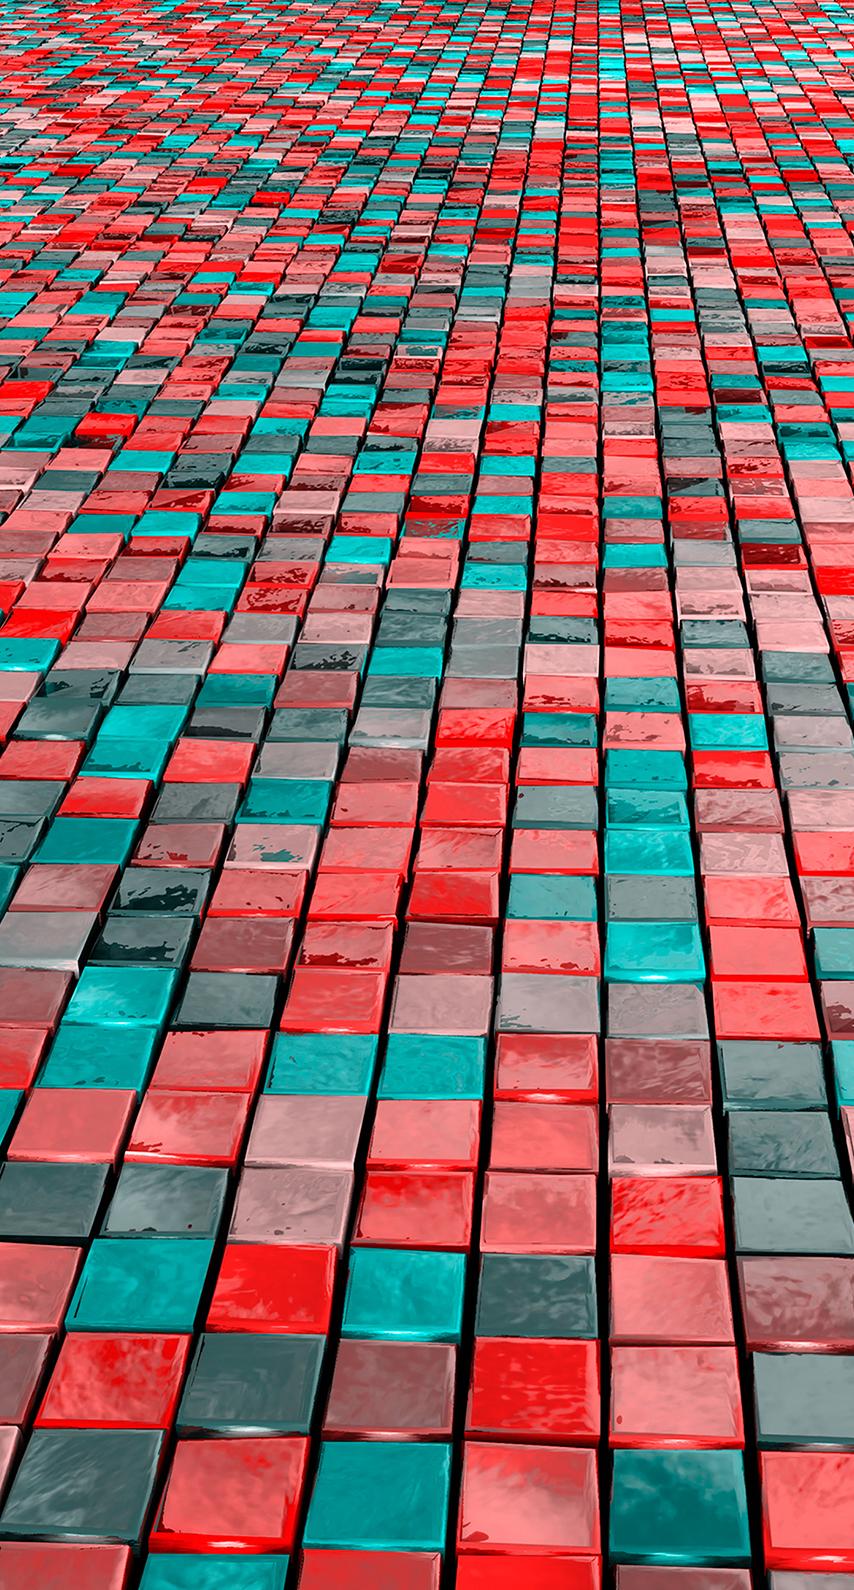 man, design, background, wallpaper, desktop, shape, line, color, motley, square, mosaic